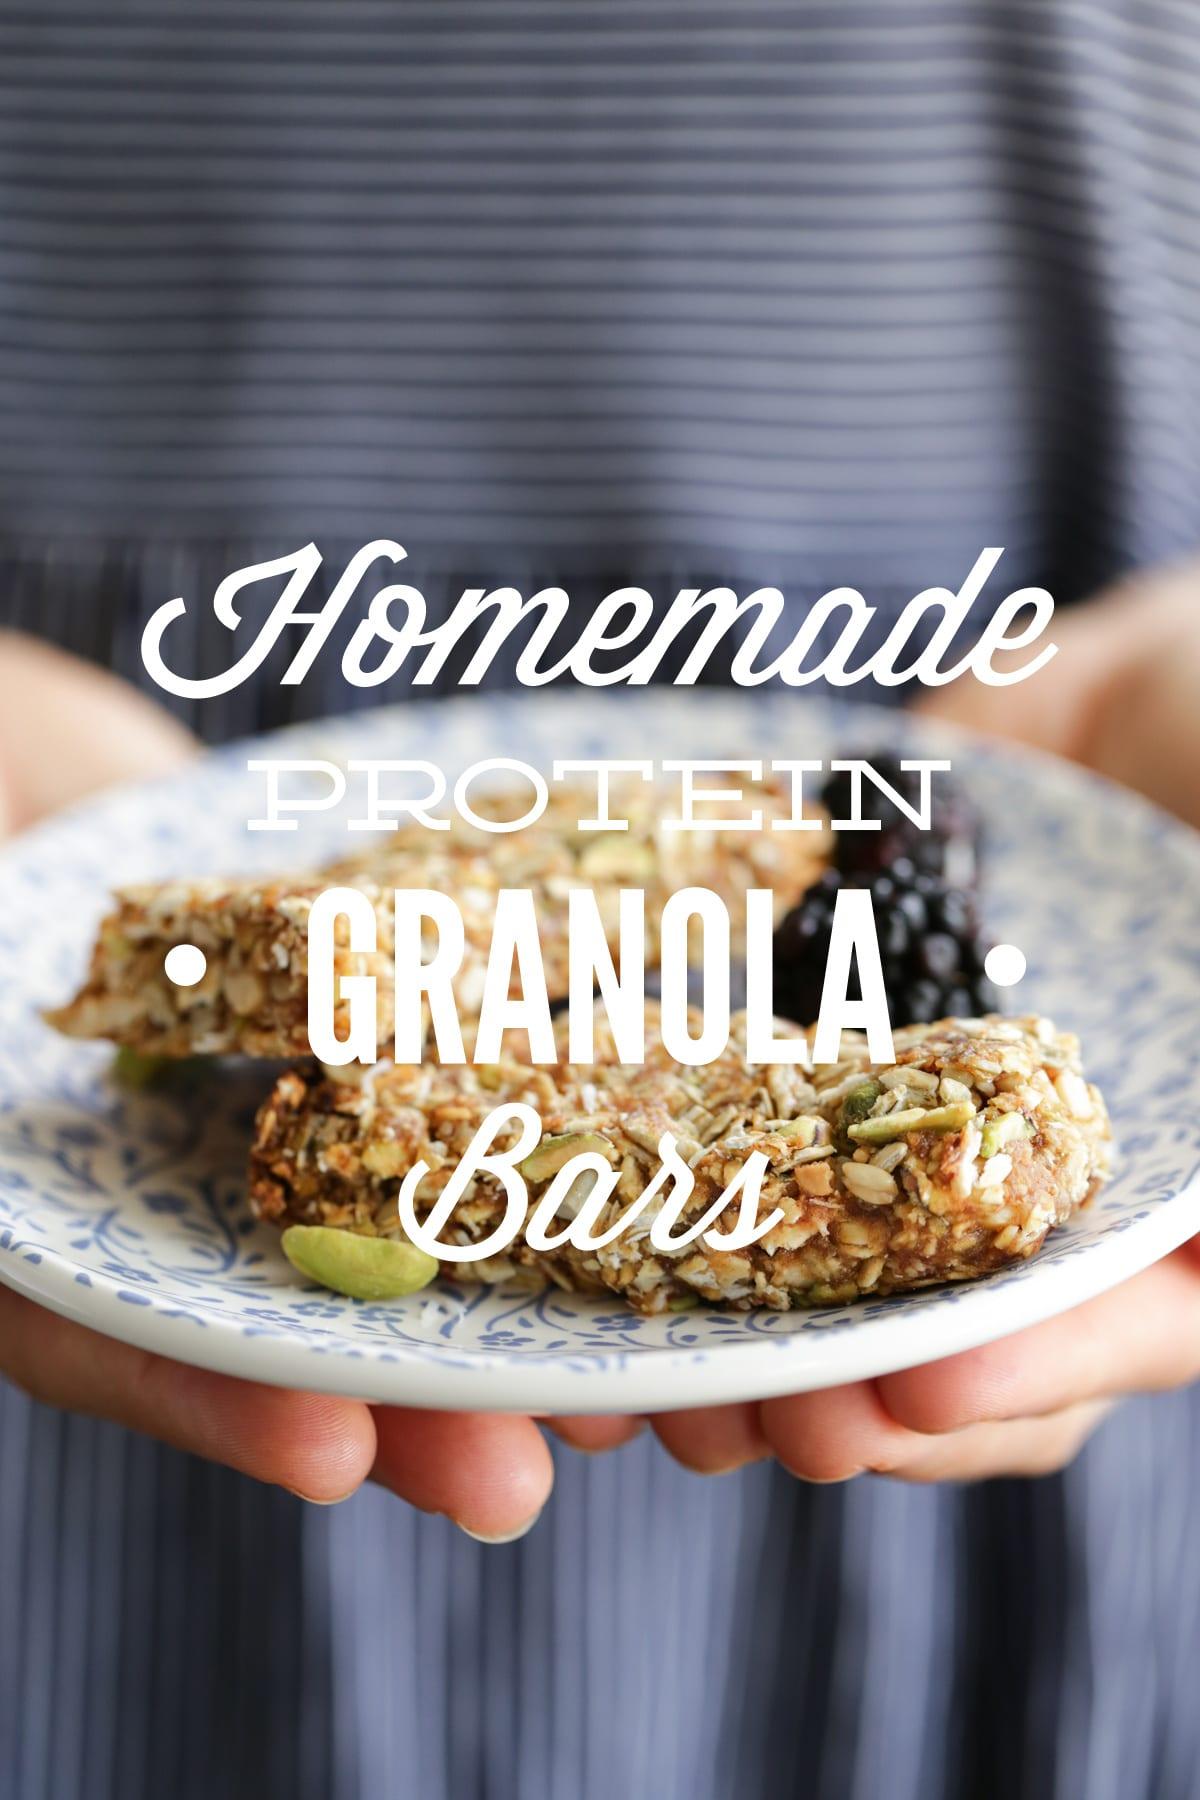 Homemade protein granola bars live simply solutioingenieria Choice Image